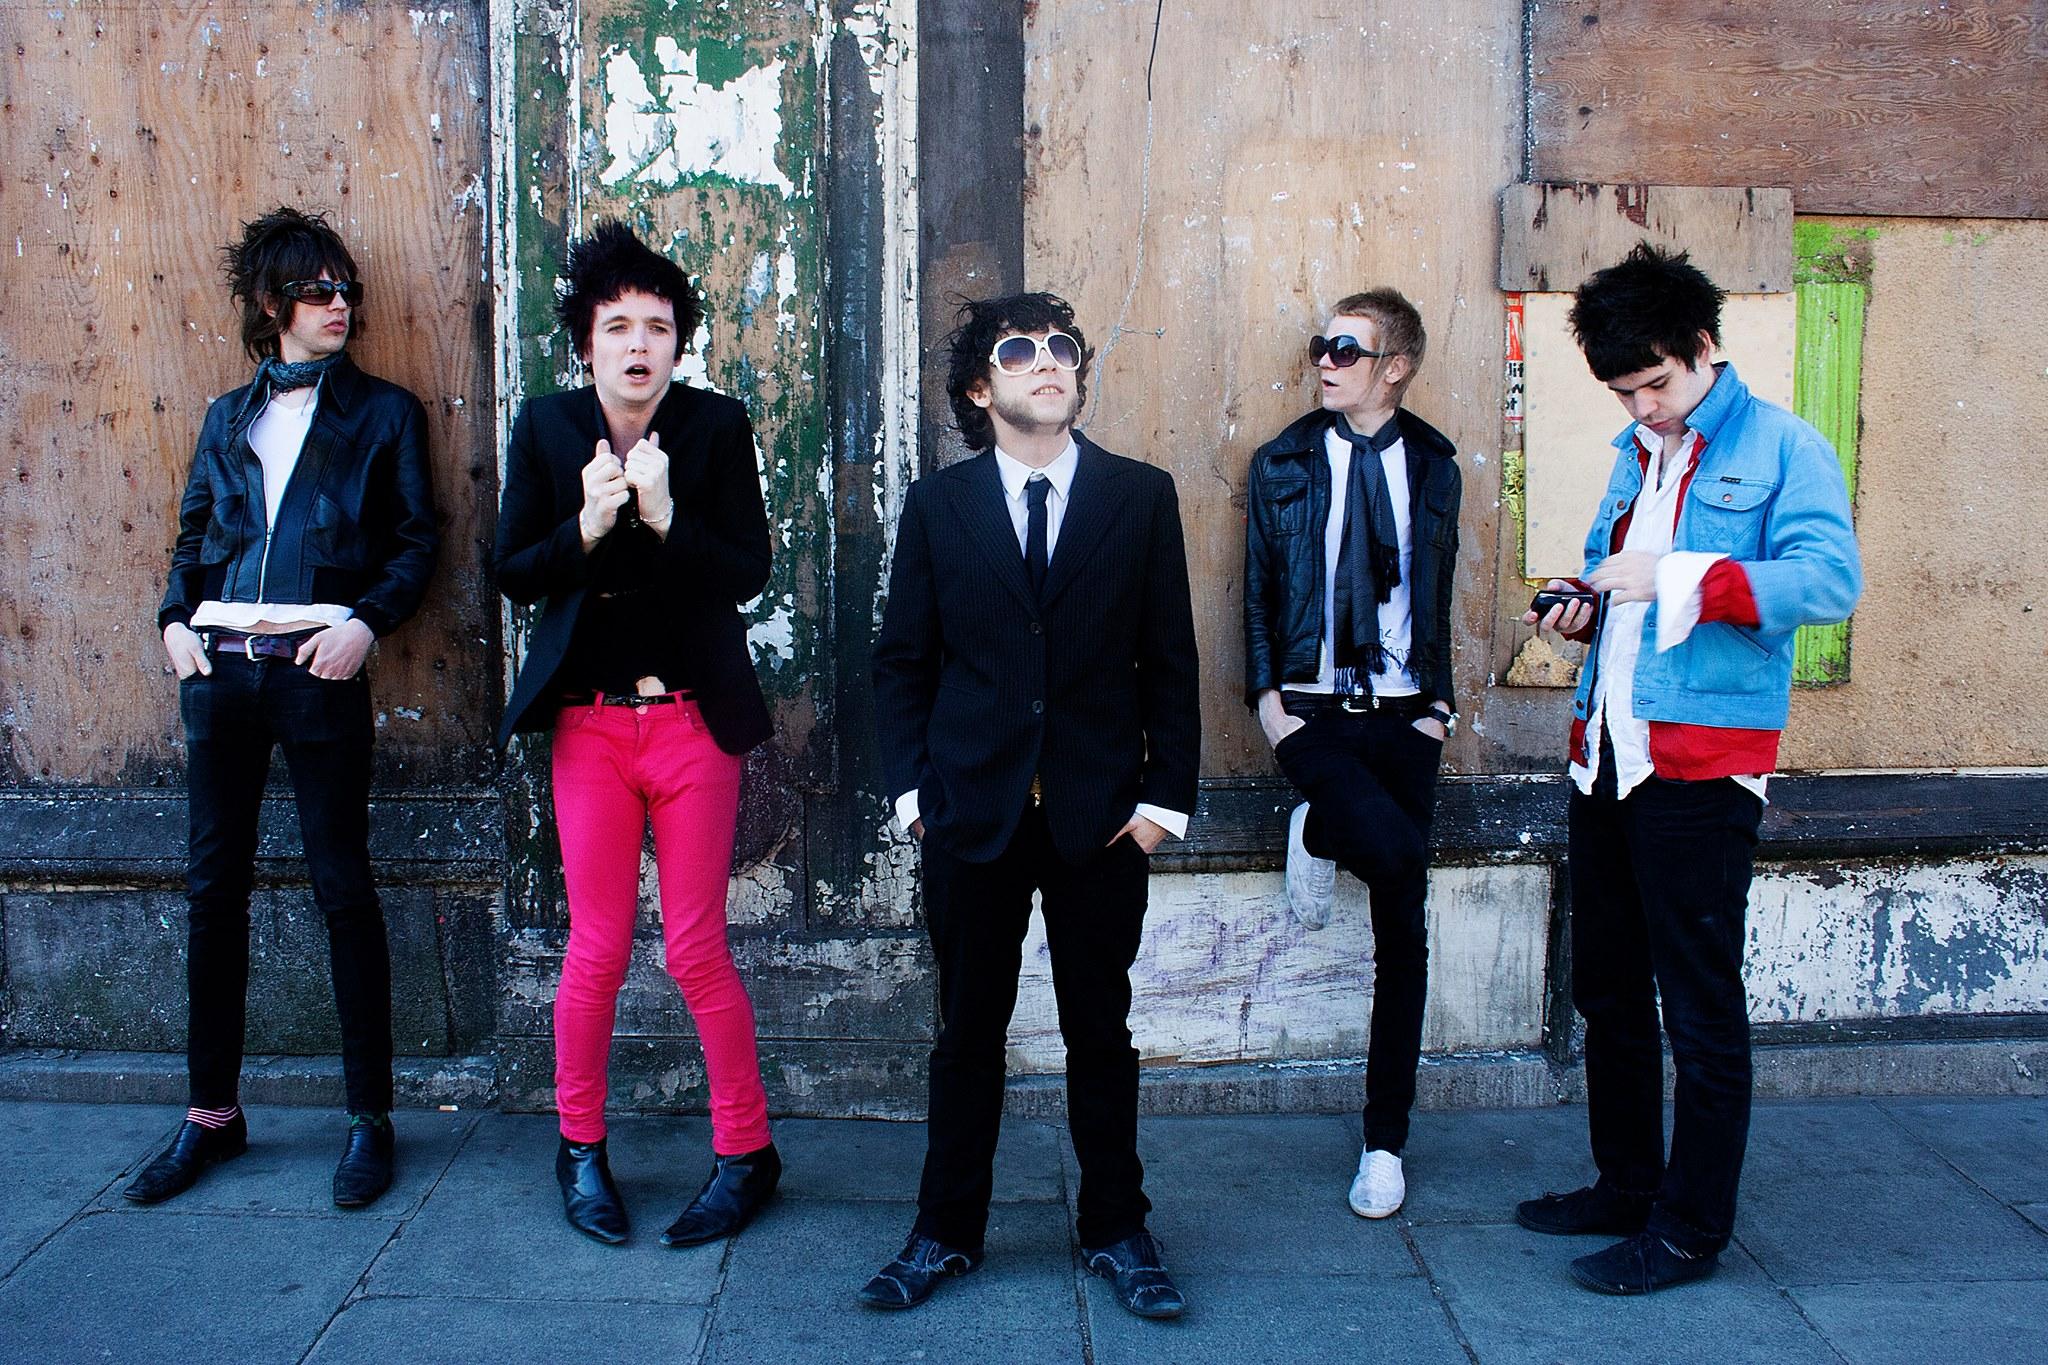 new album alert-the vivians-10th anniversay- indie music-new music-punk rock-indie rock-wolfinasuit-wolf in a suit